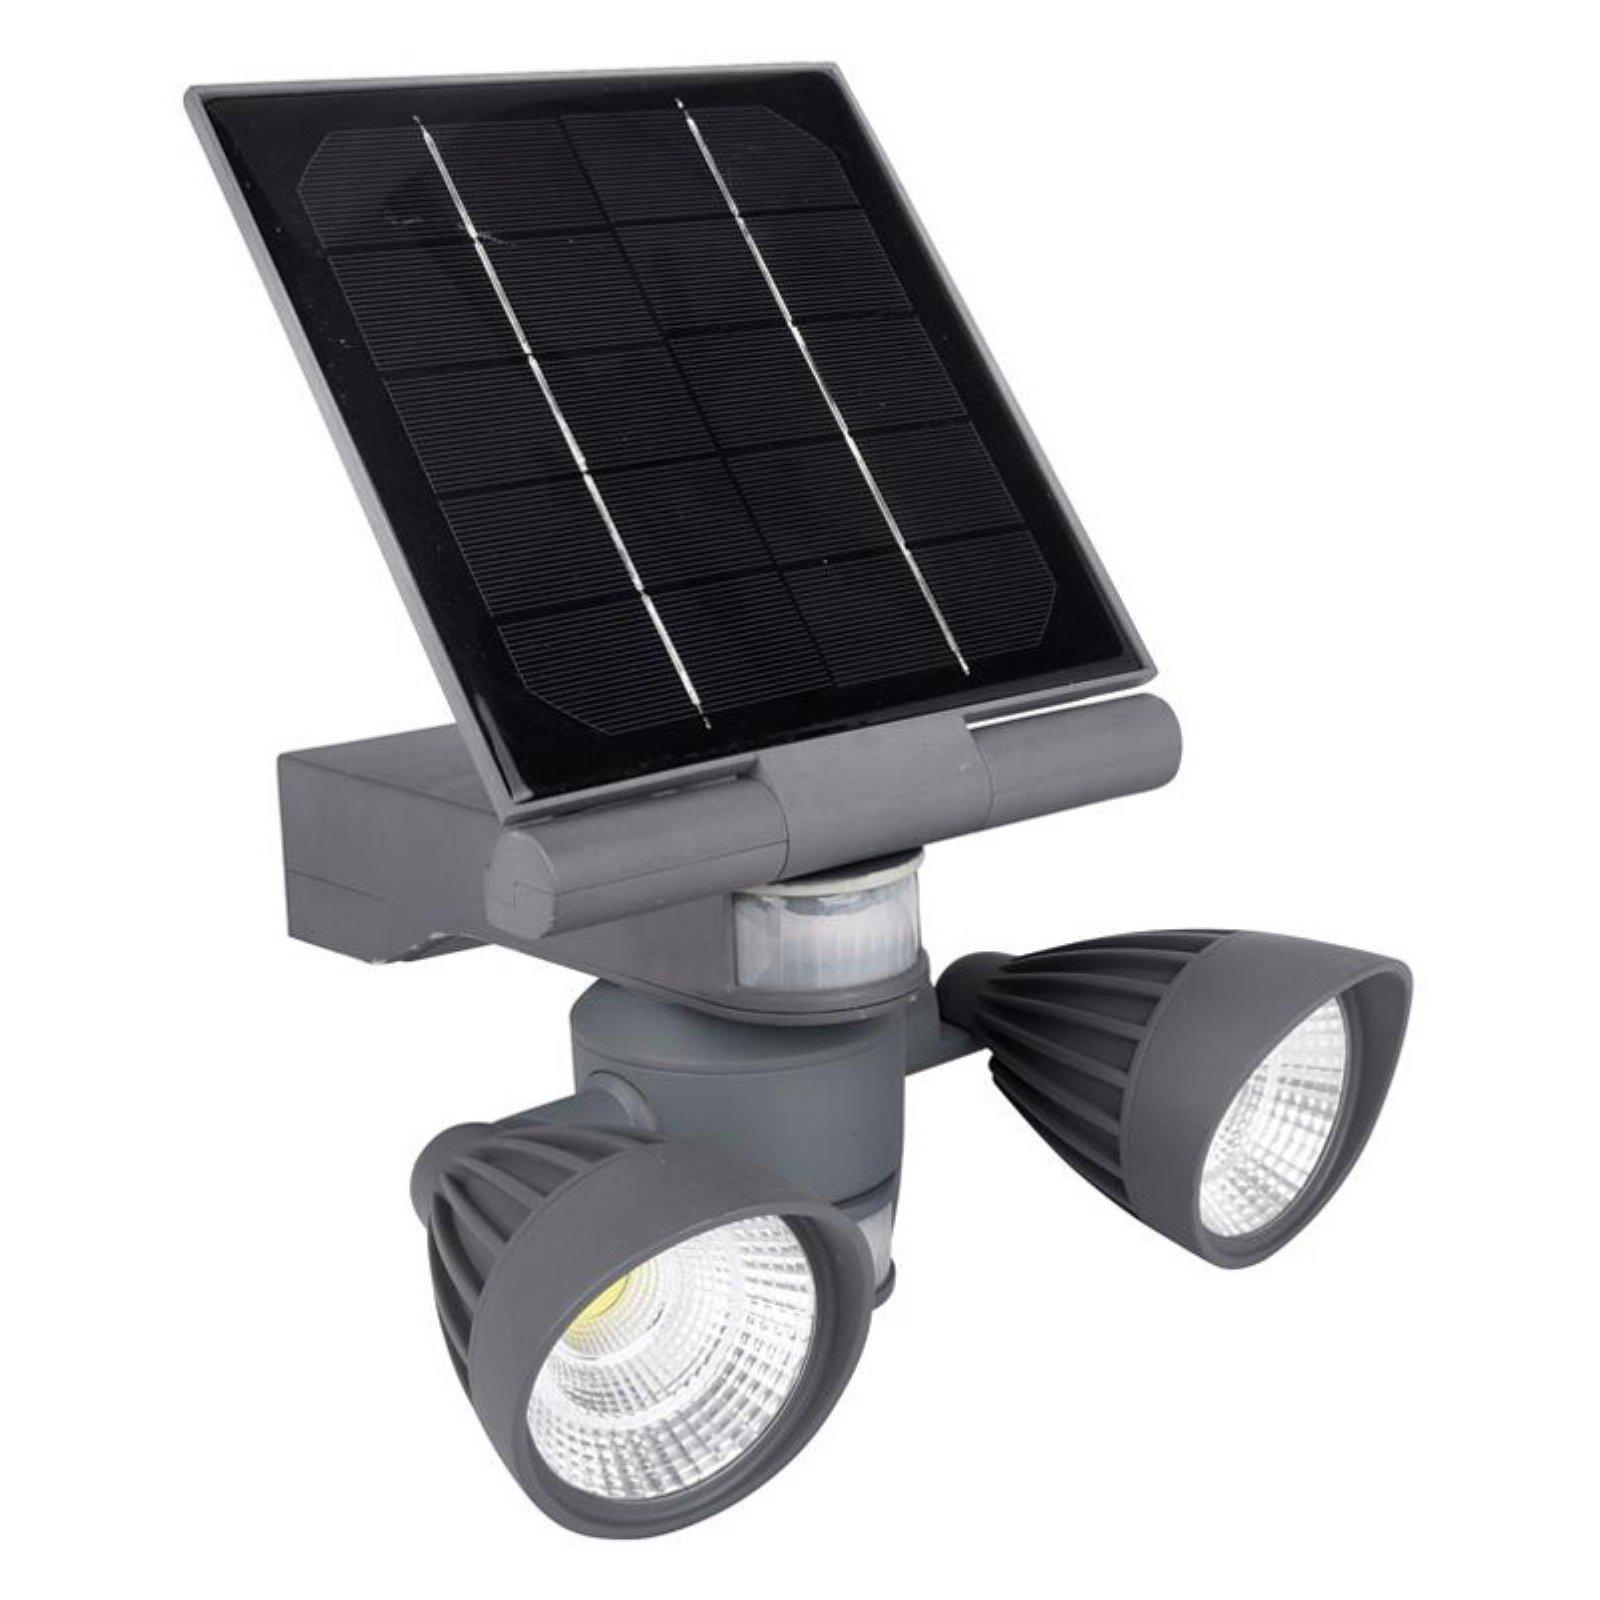 Pacific Accents Sol Wtt 1010 Outdoor Solar Spot Light